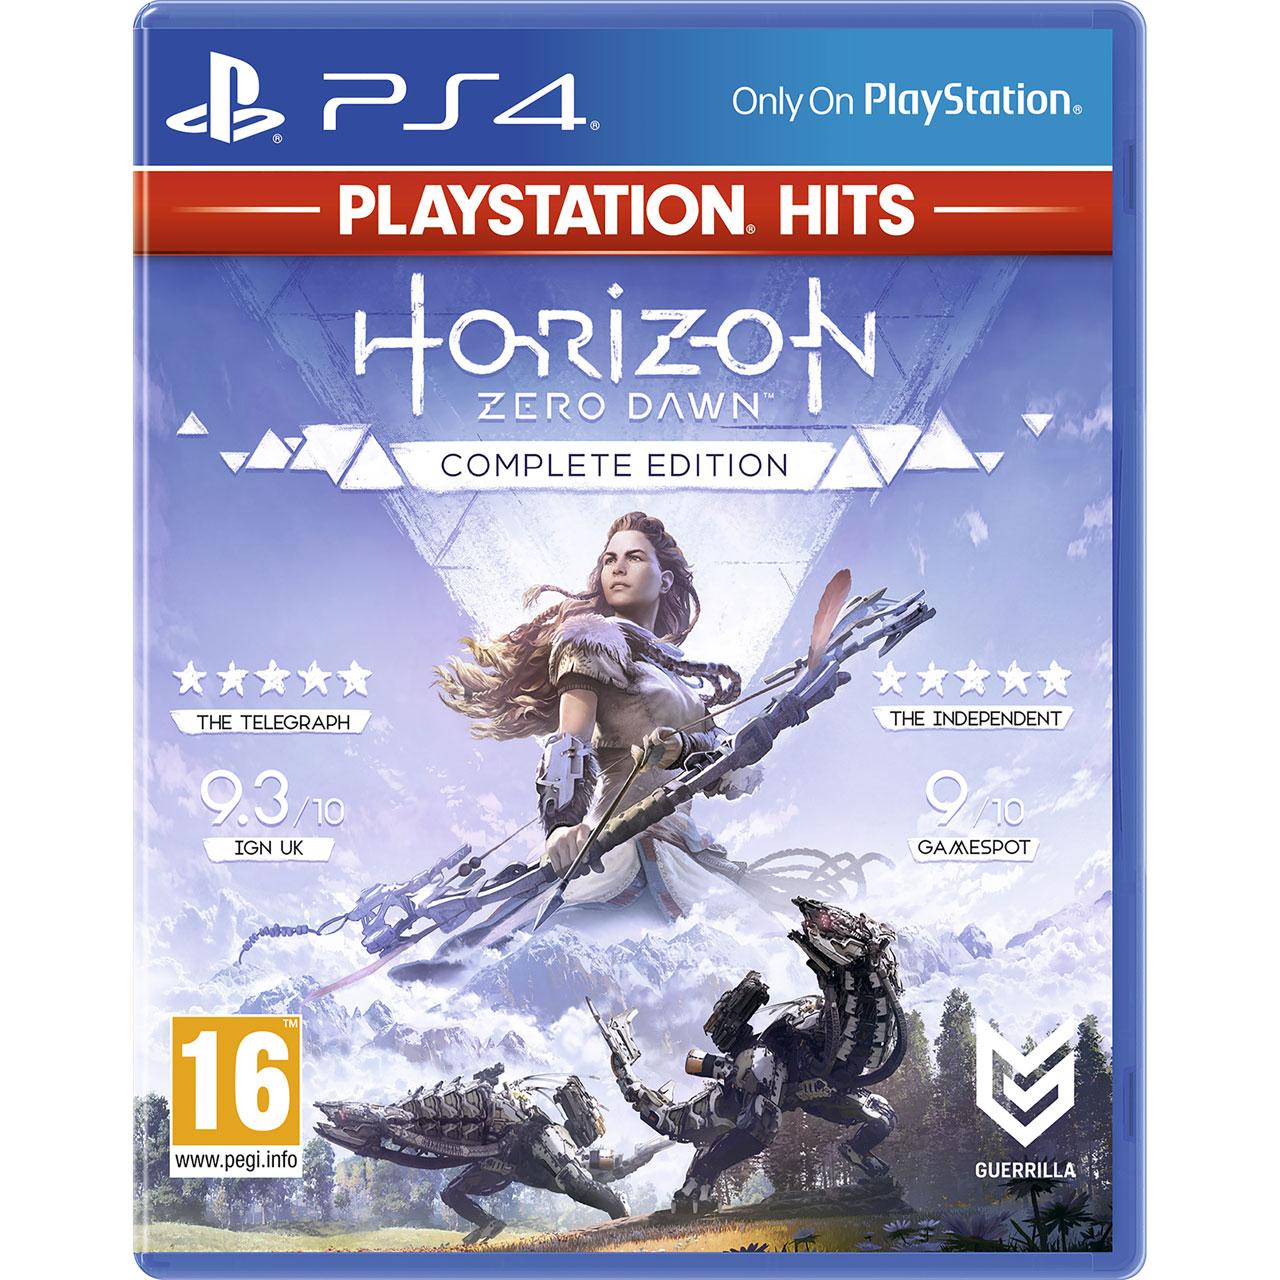 Horizon Zero Dawn: Playstation Hits for PlayStation 4 - £11 Delivered @ AO